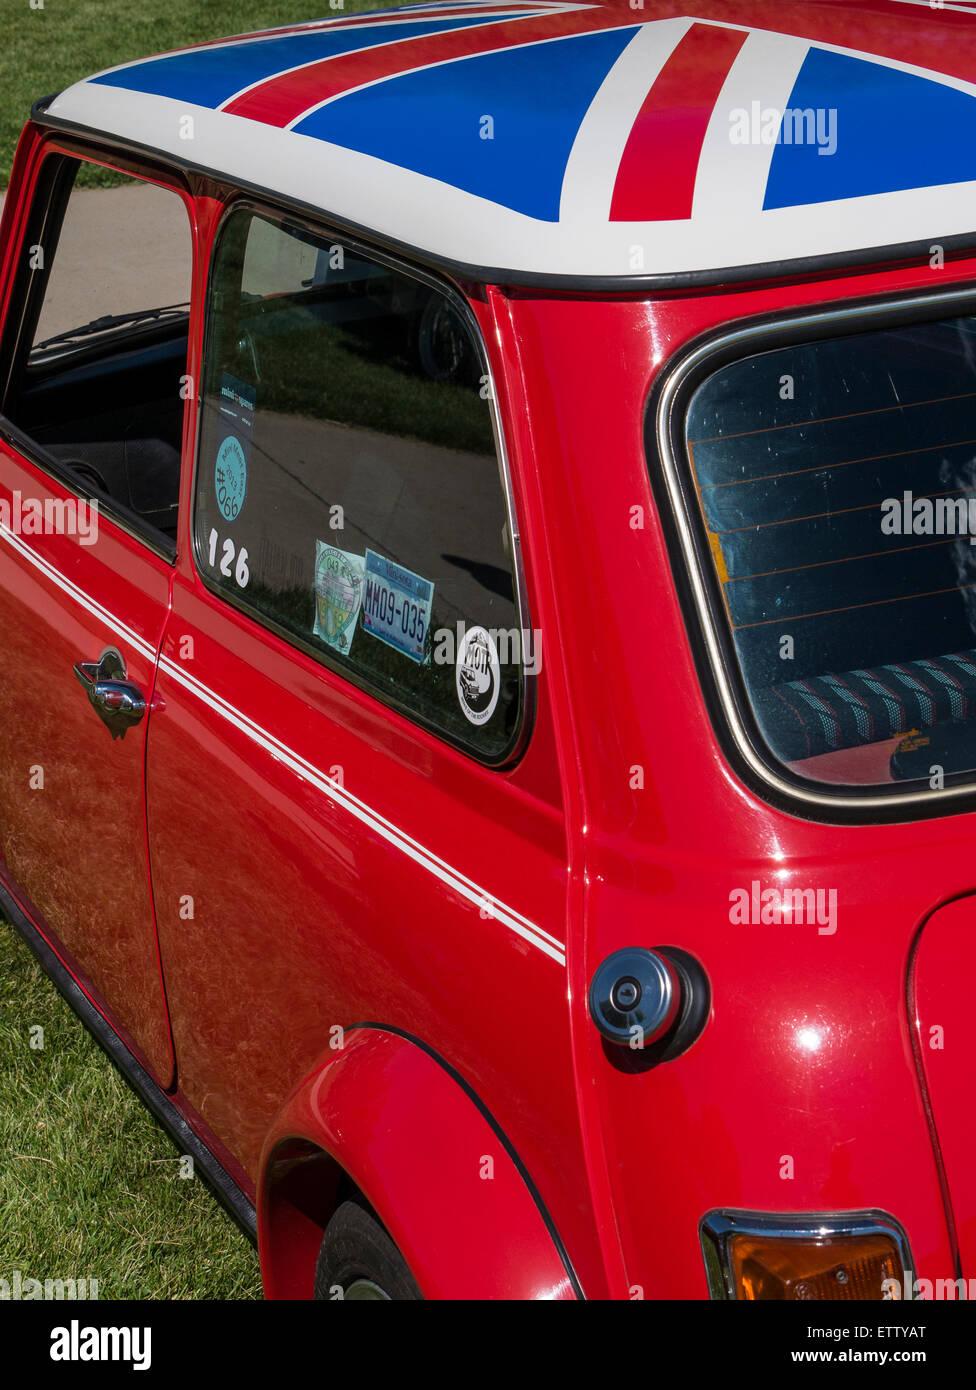 1973 Mini Cooper, MG Car Rallye, Glenwood Springs, Colorado. - Stock Image